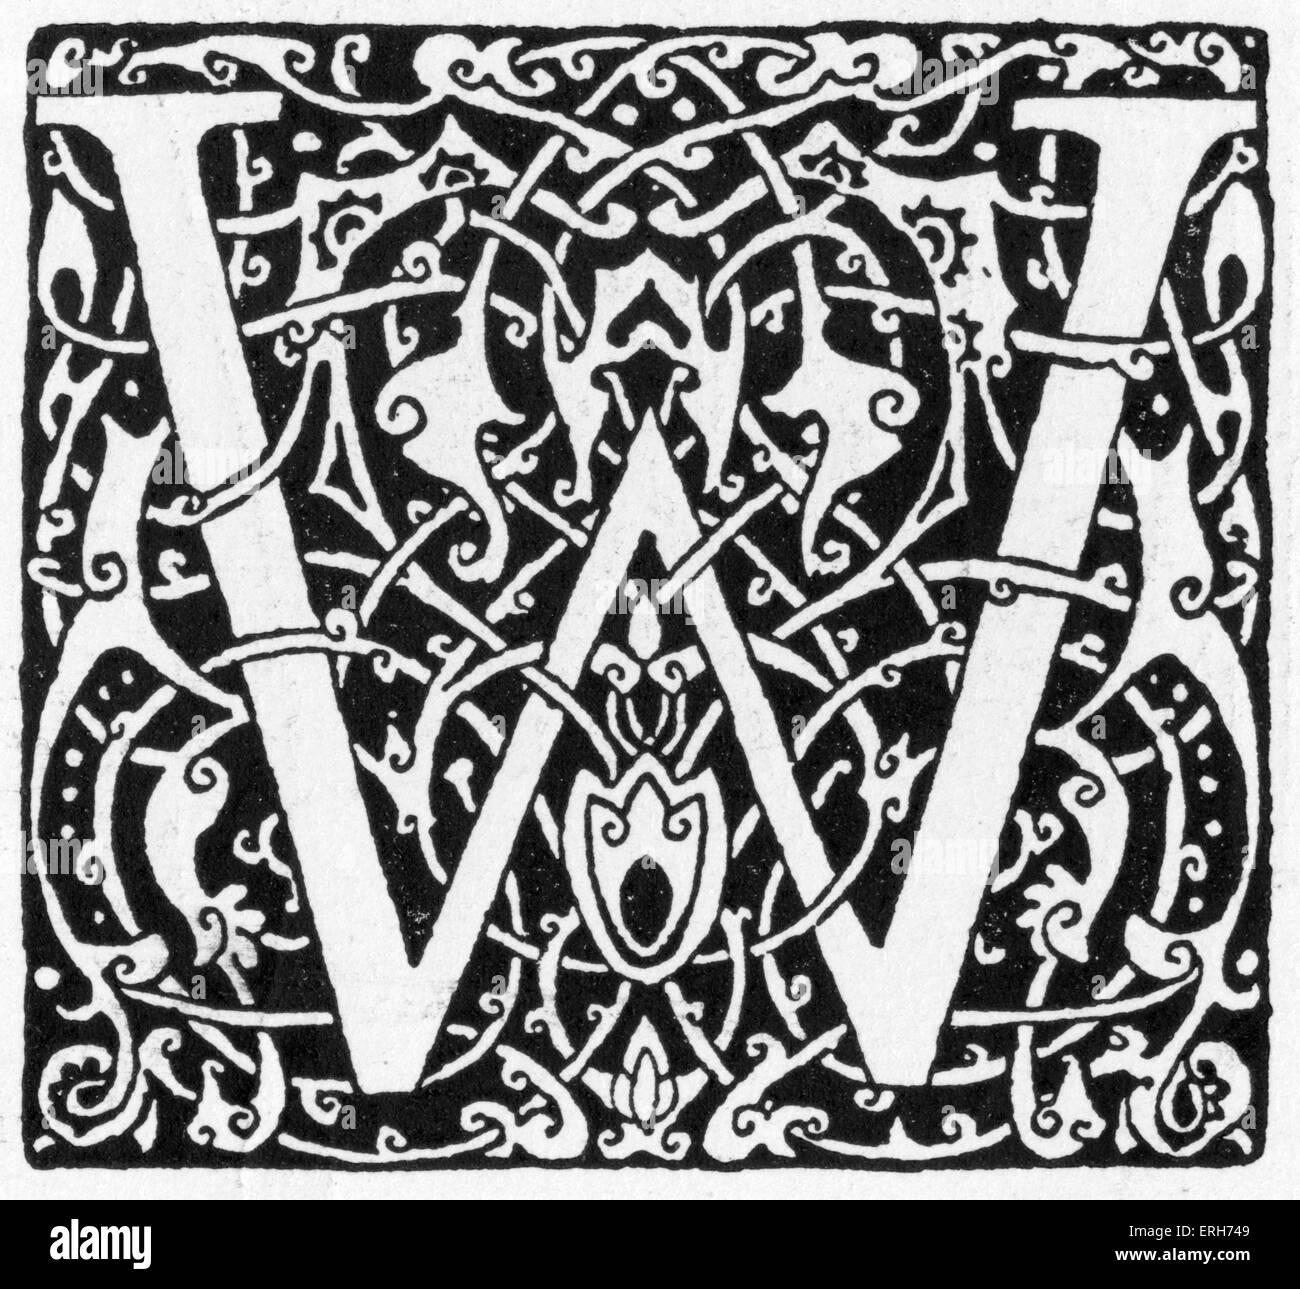 Illuminated 'W' from Goethe 's  East-West Divan / Westöstlichen Divan 1910 in  Die Insel ( The - Stock Image